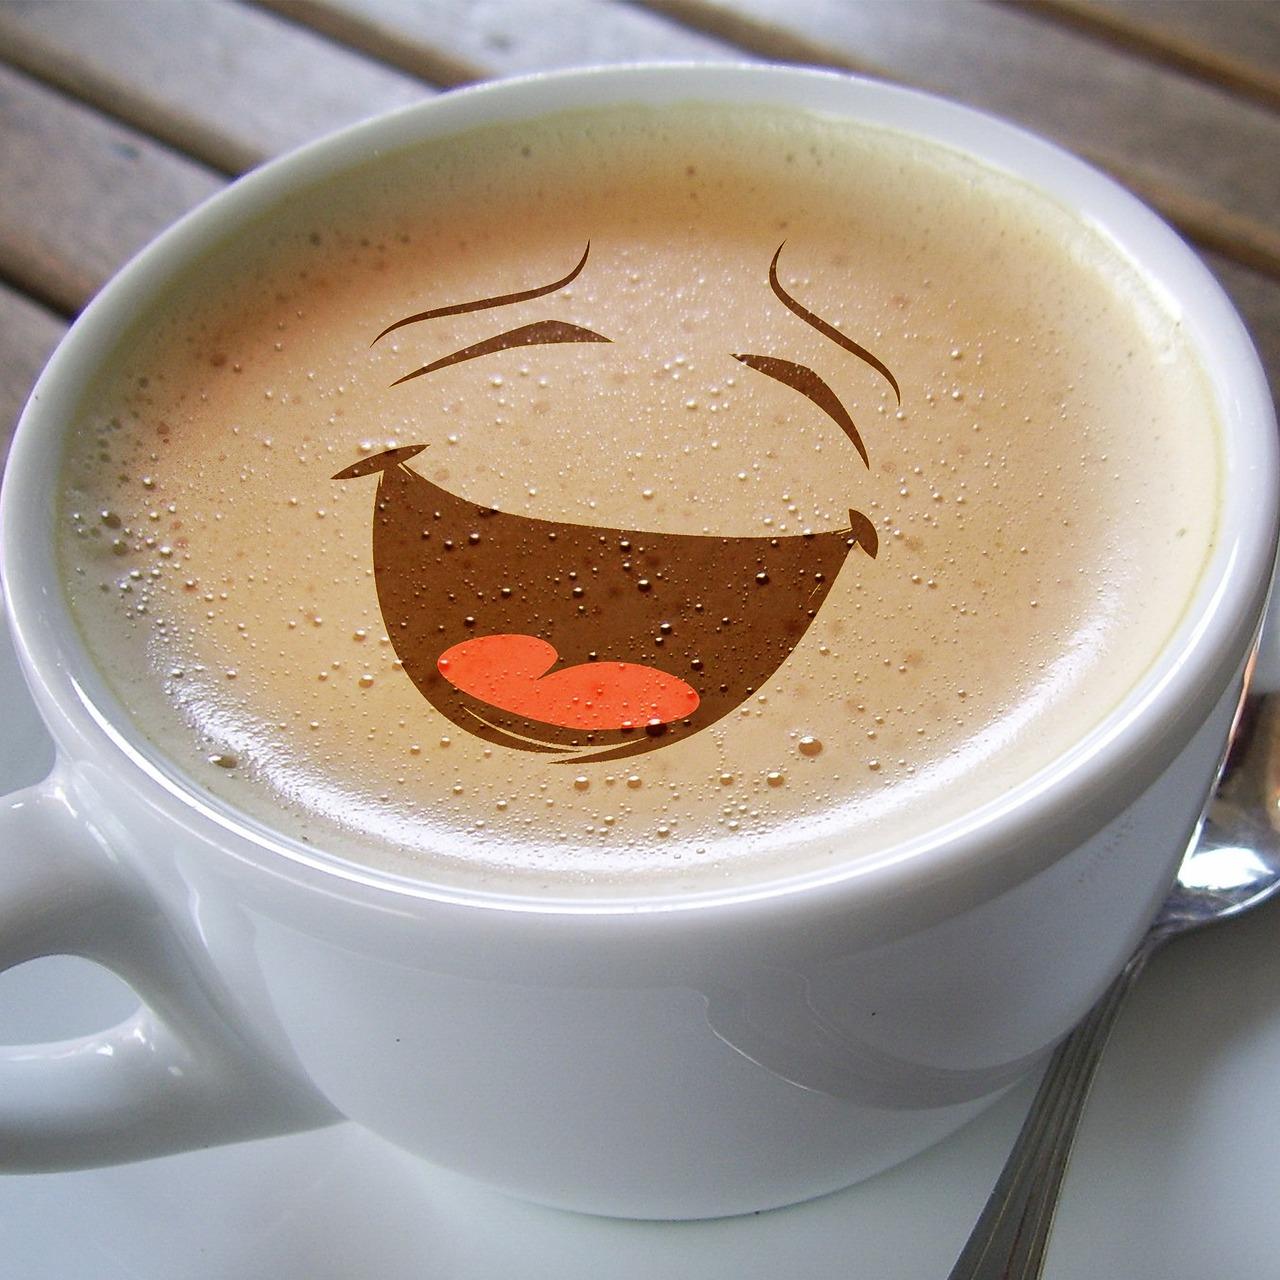 Freshly Roasted Coffee Beans to make Spooky Halloween Drinks